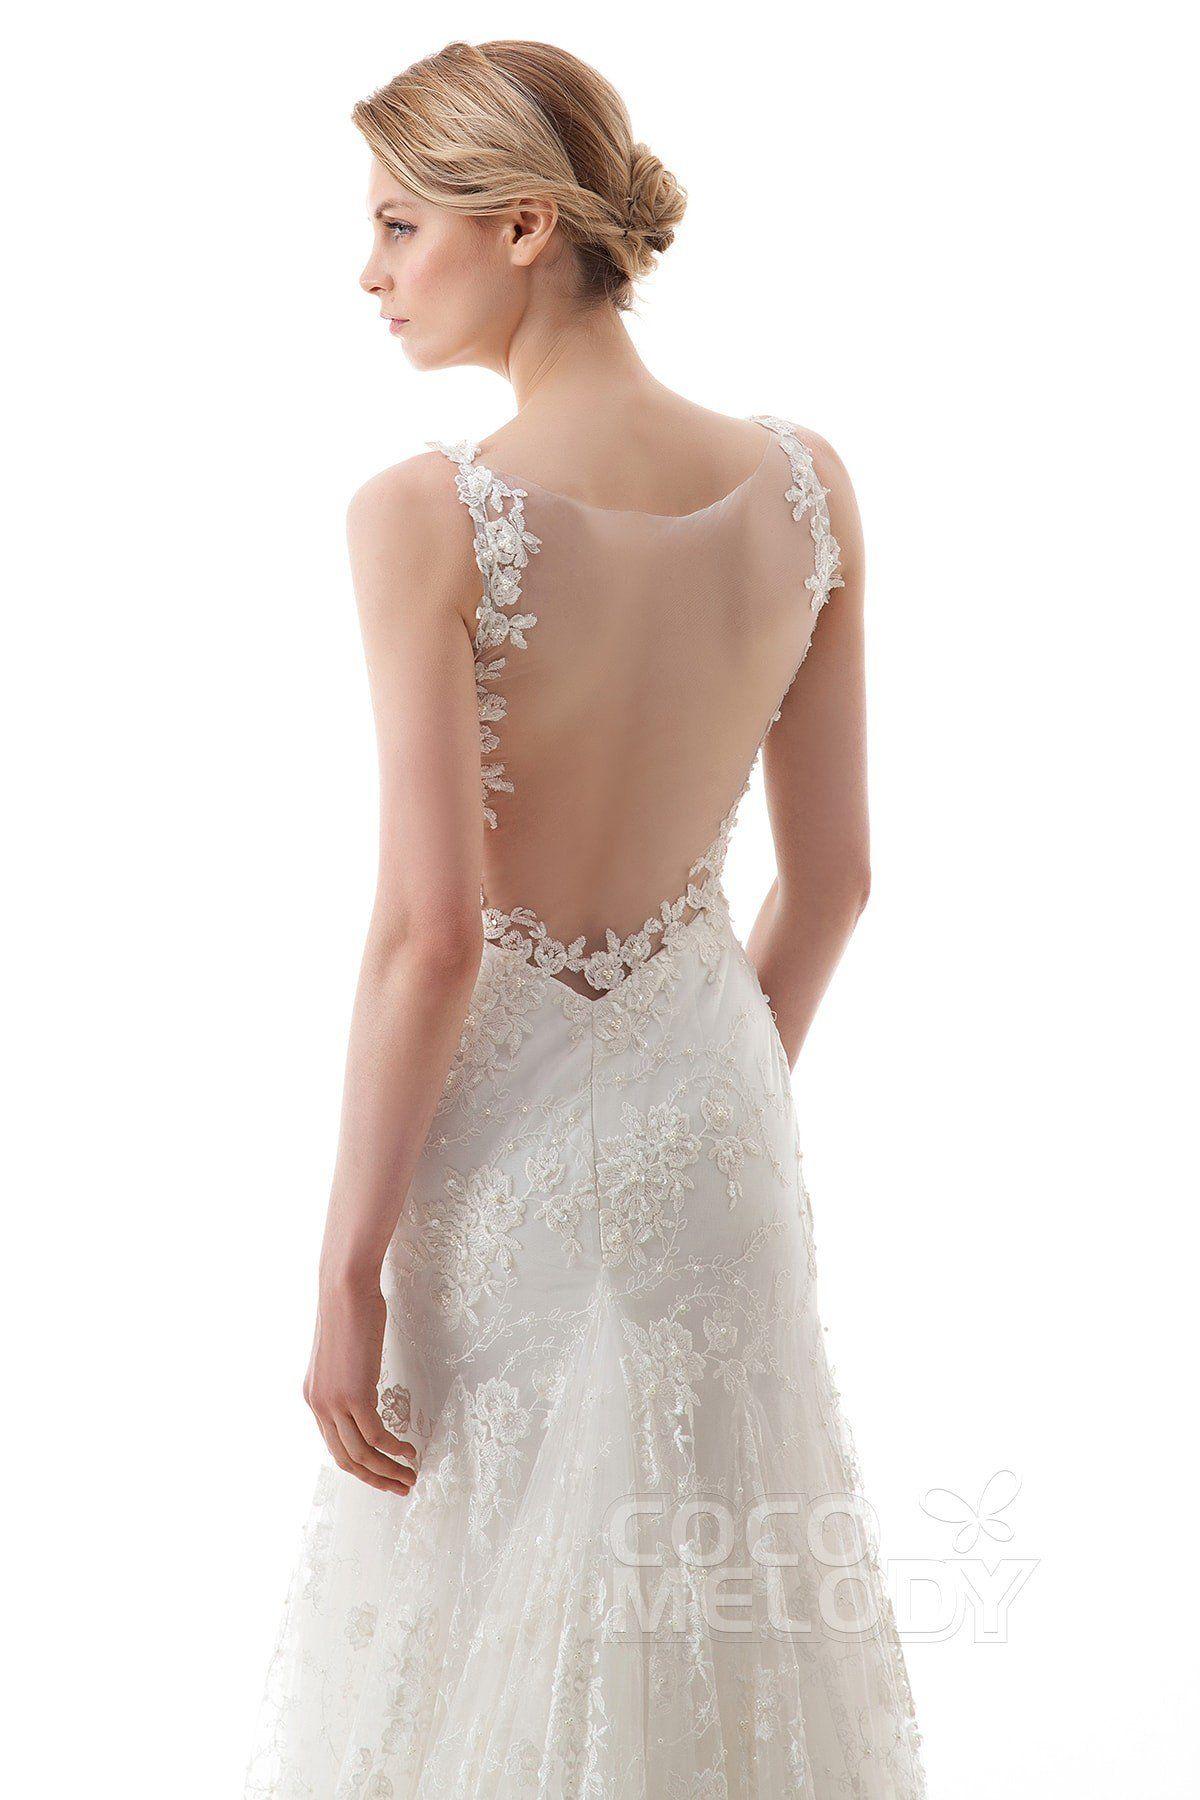 Best wedding dresses for short waisted  TrumpetMermaid SweepBrush Train Lace Wedding Dress LWVTA